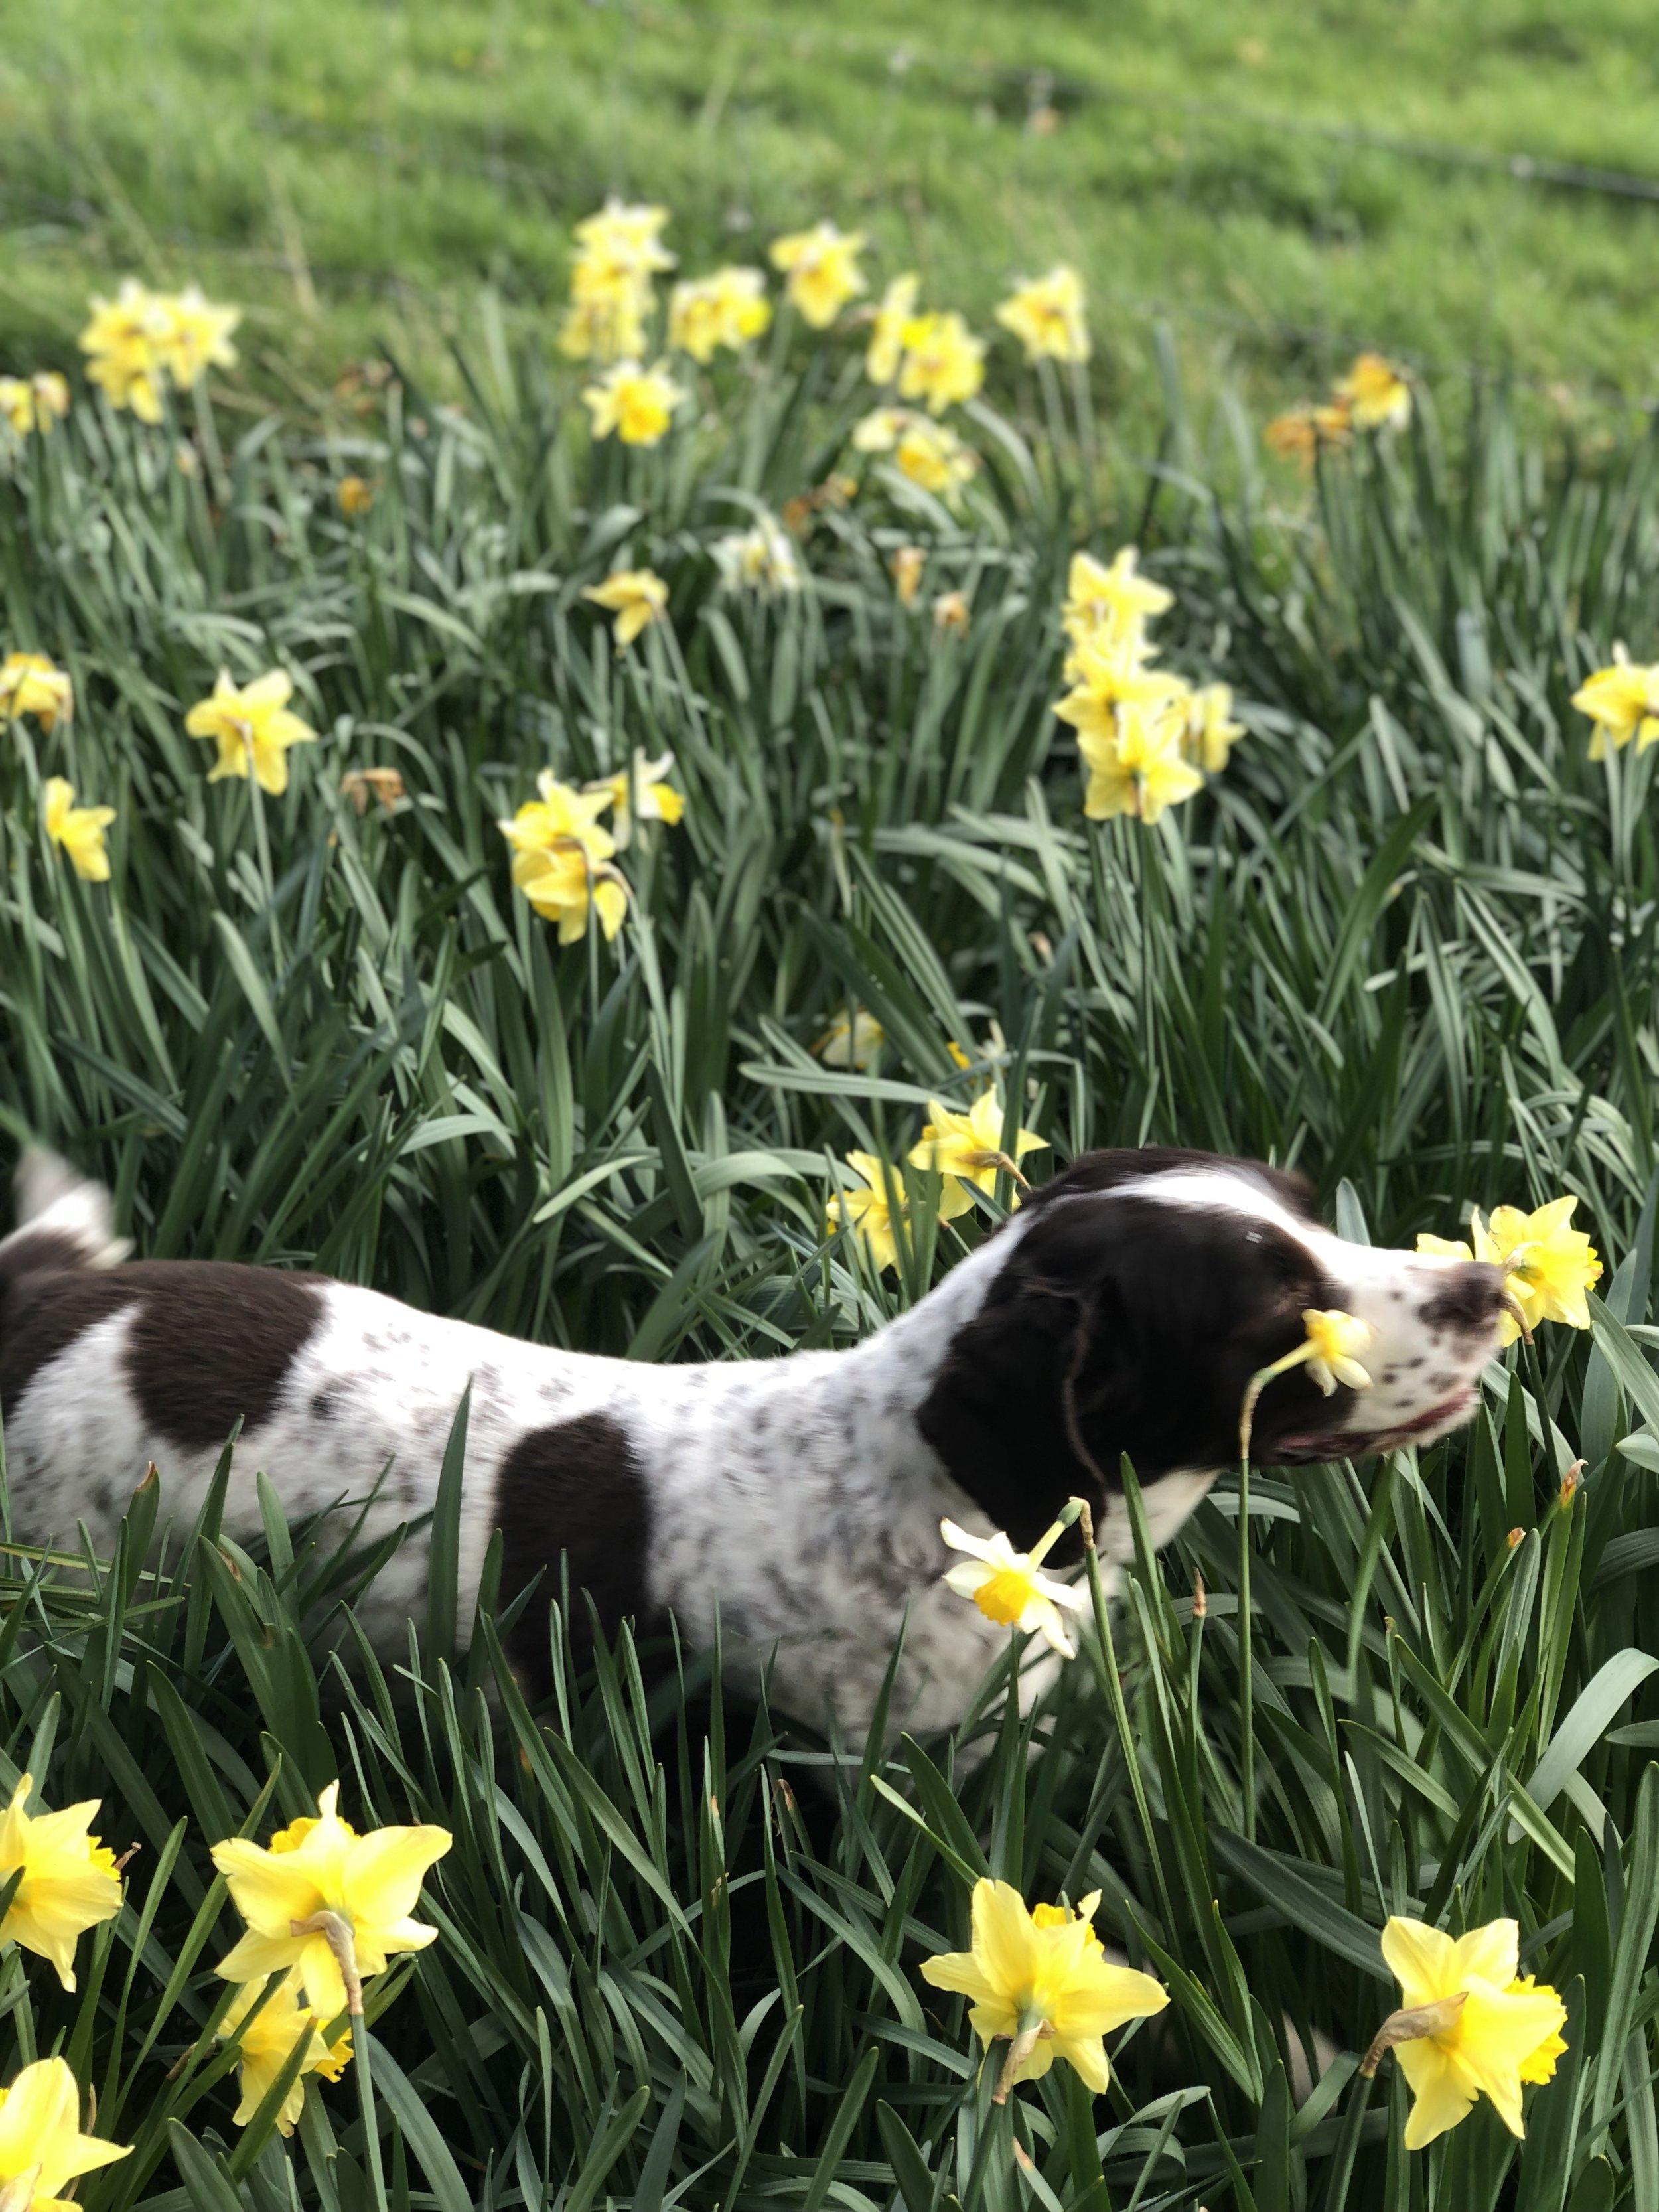 Jemima - in the Daffodils